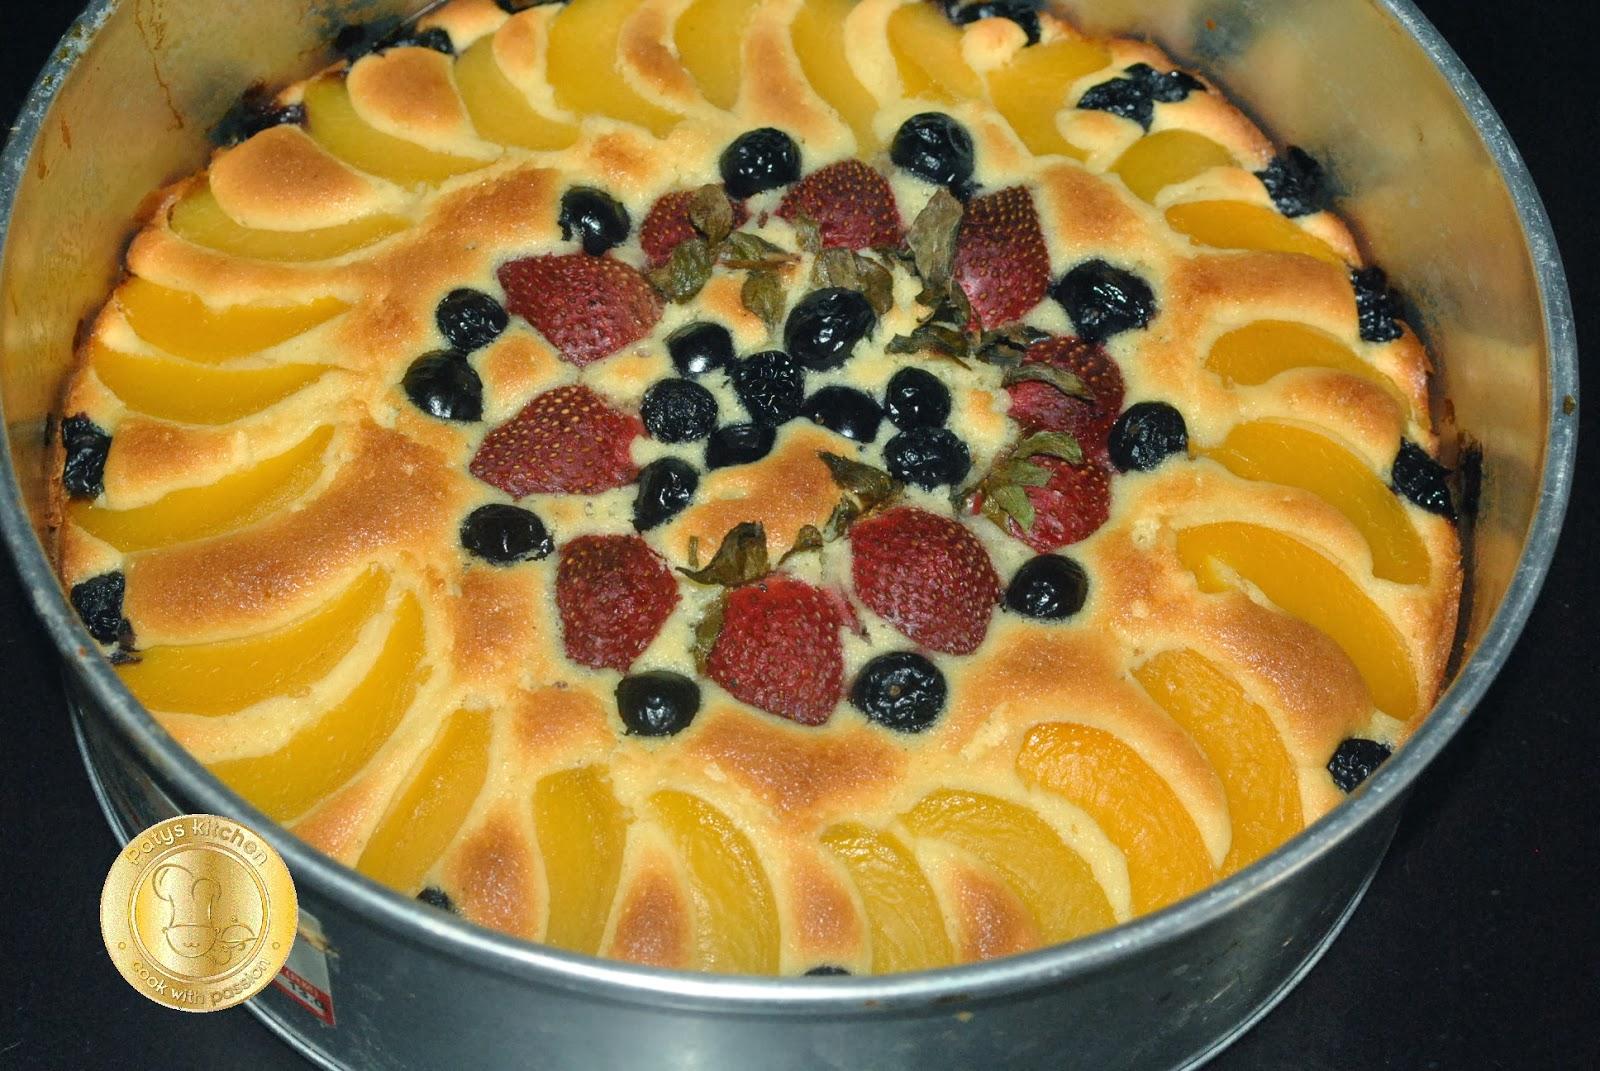 Patyskitchen Fresh Fruits Pastry Cake